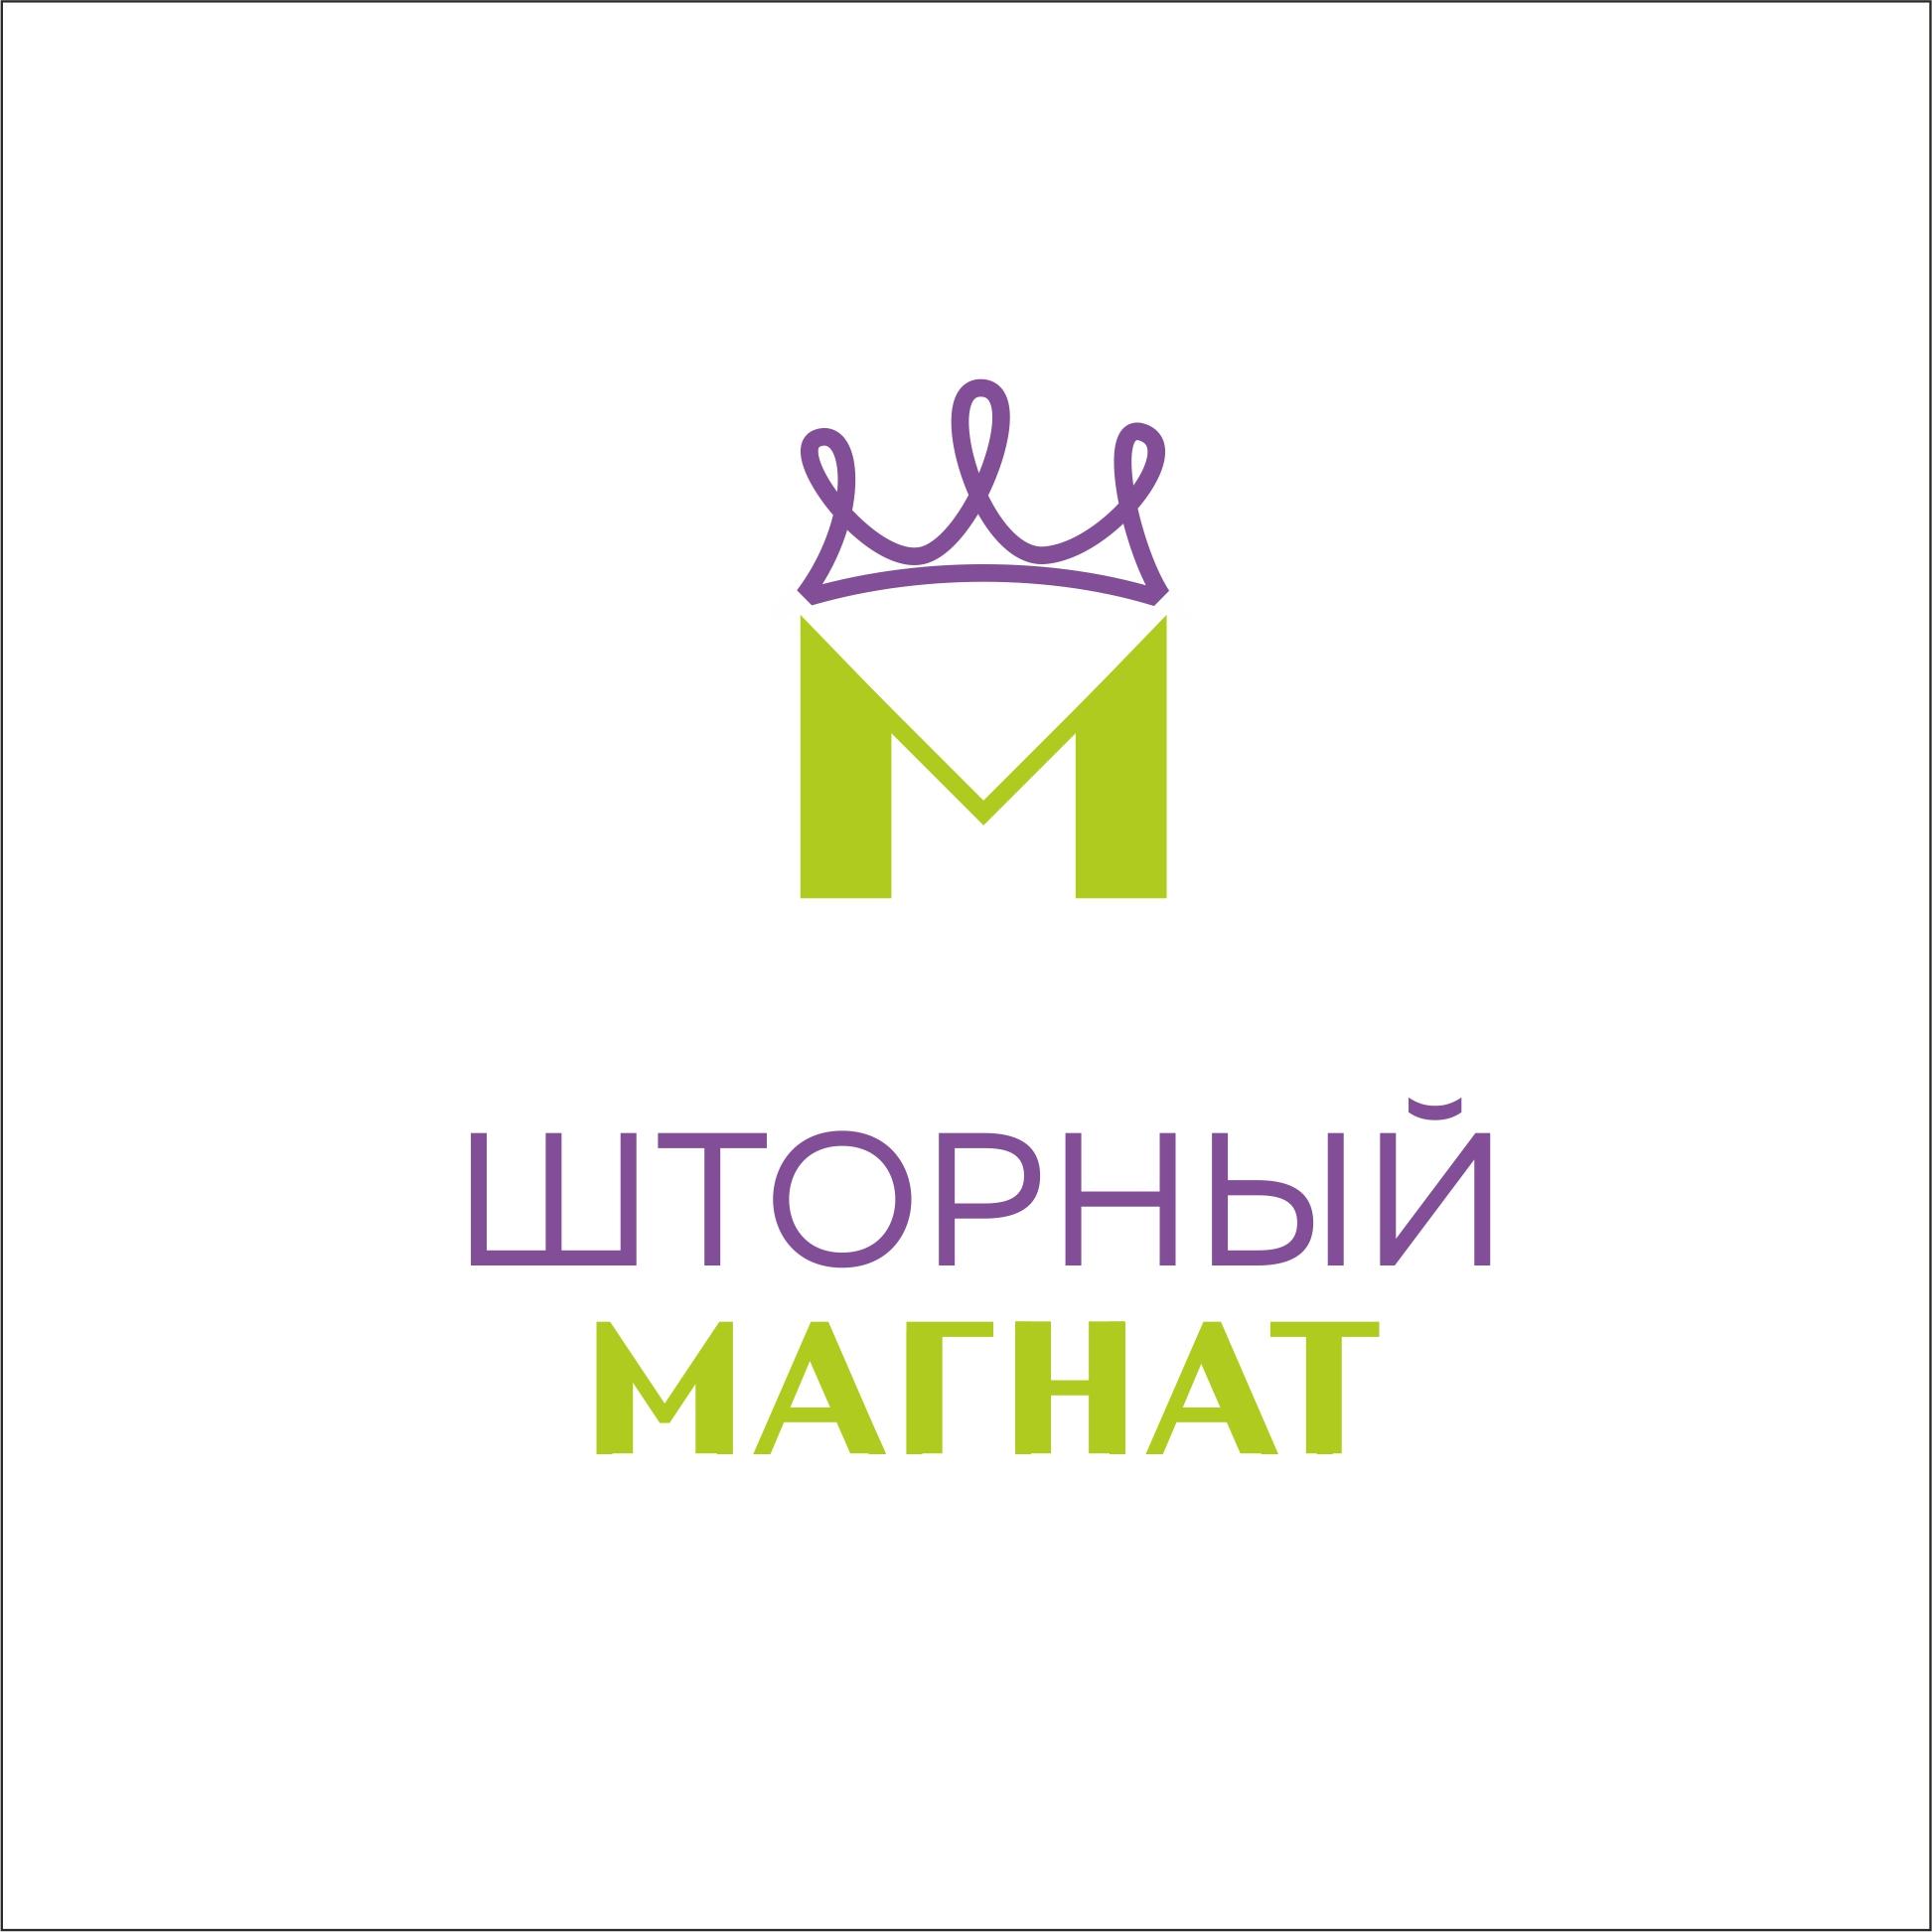 Логотип и фирменный стиль для магазина тканей. фото f_9285cdc62014cf9b.jpg